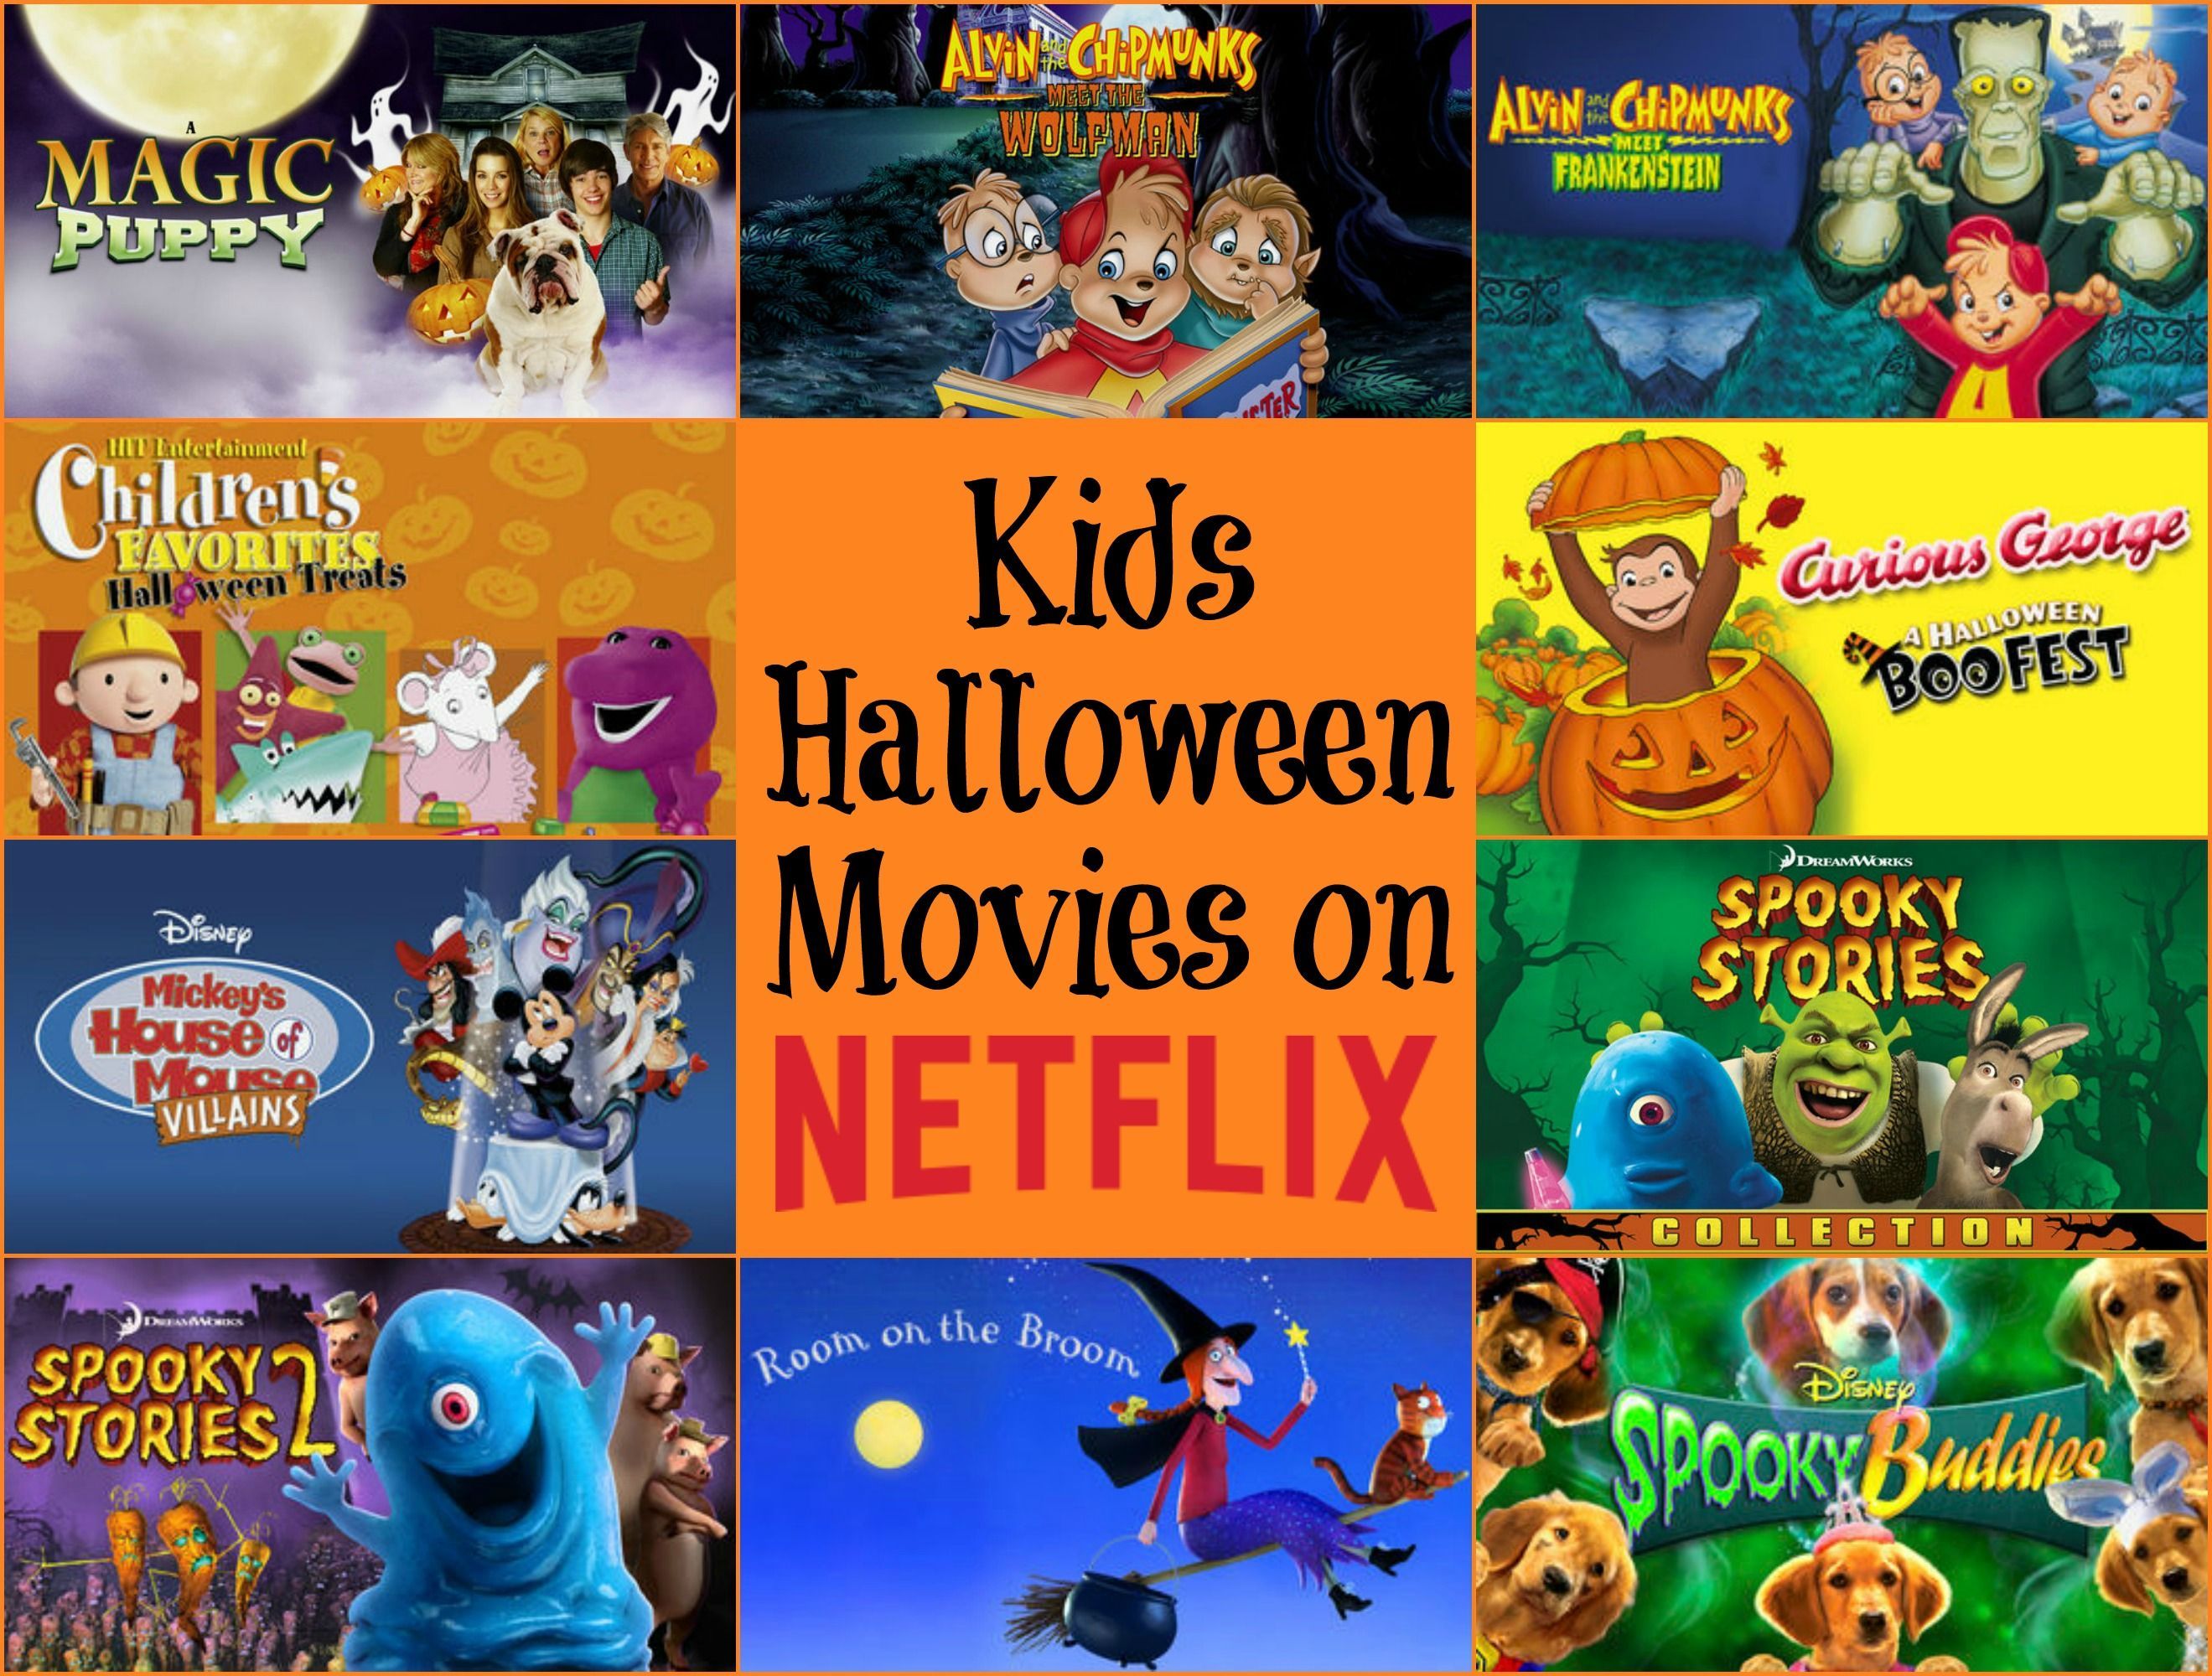 Kids Halloween Movies on Netflix! StreamTeam Halloween